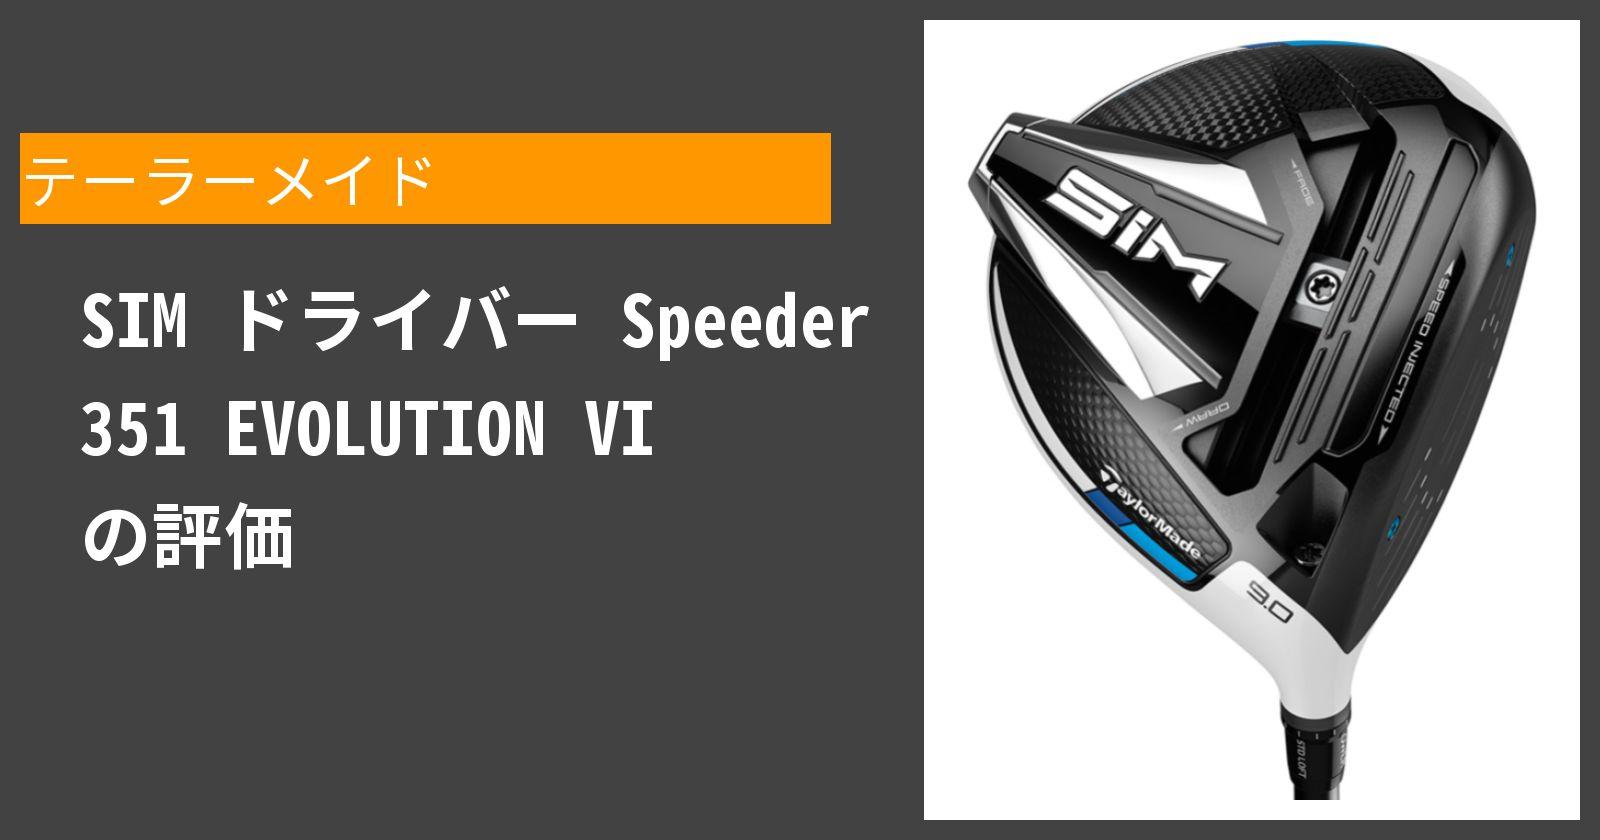 SIM ドライバー Speeder 351 EVOLUTION VIを徹底評価